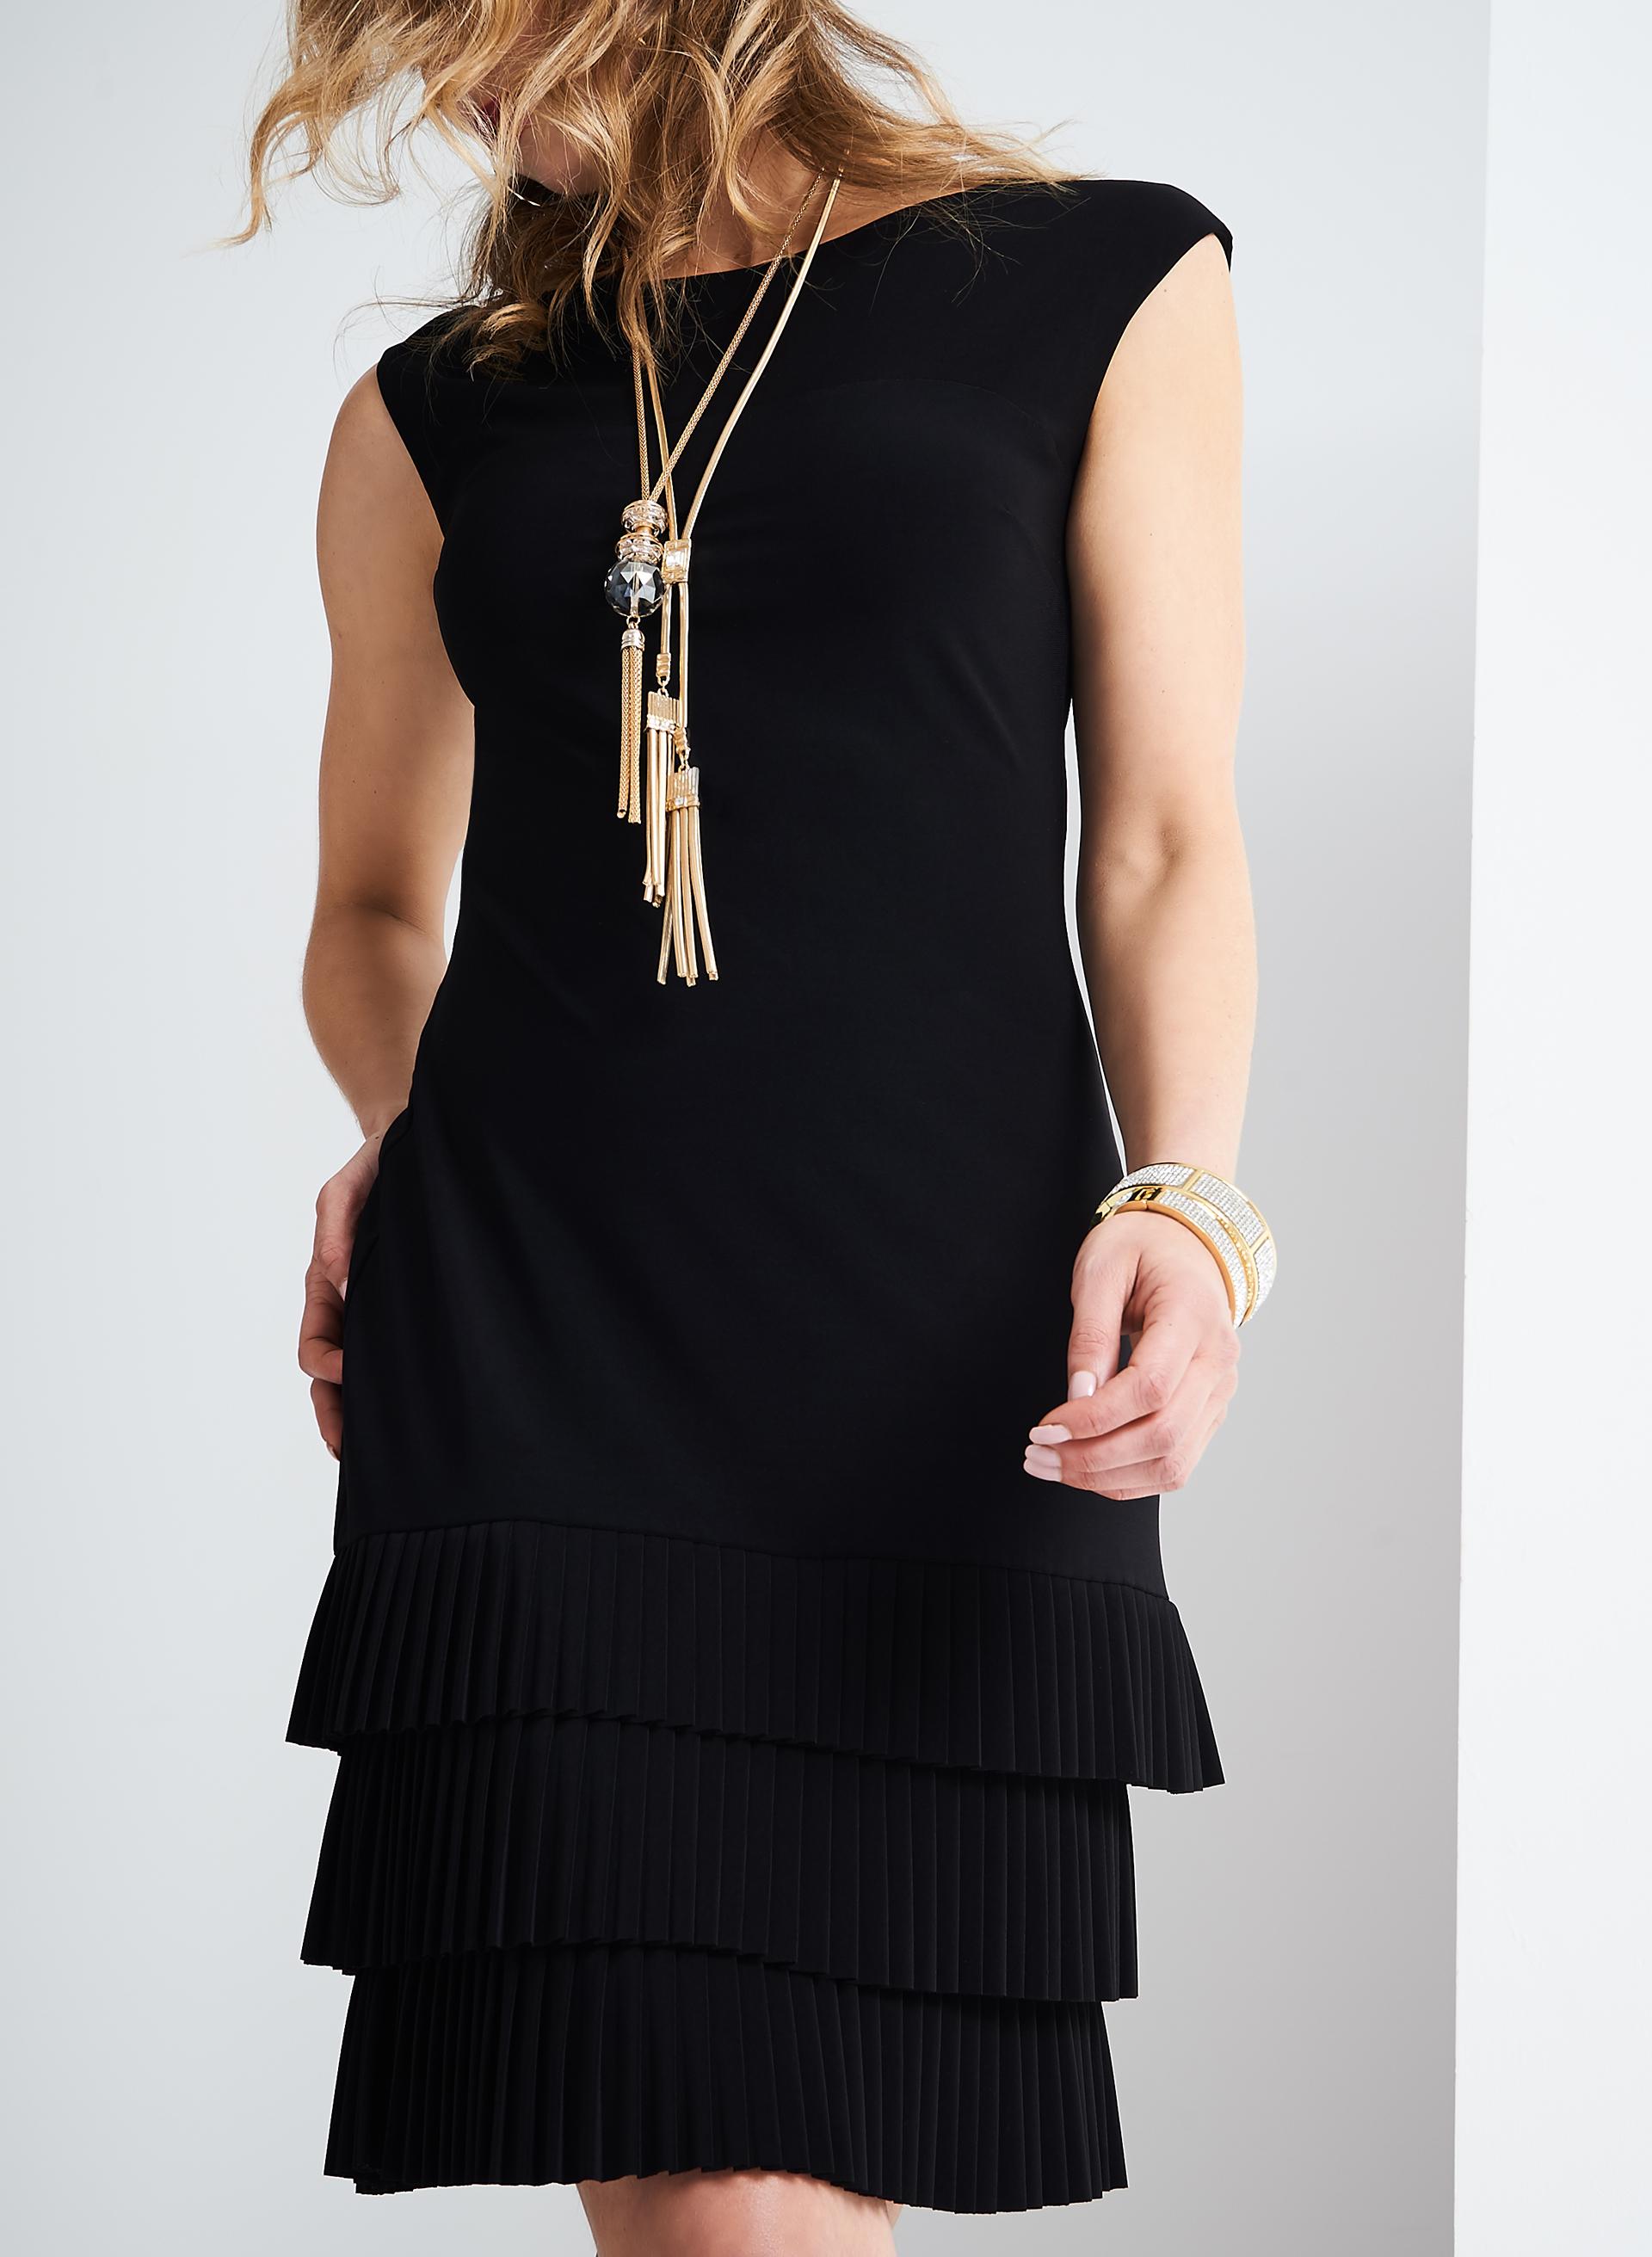 frank lyman jersey fringe dress free shipping melanie. Black Bedroom Furniture Sets. Home Design Ideas